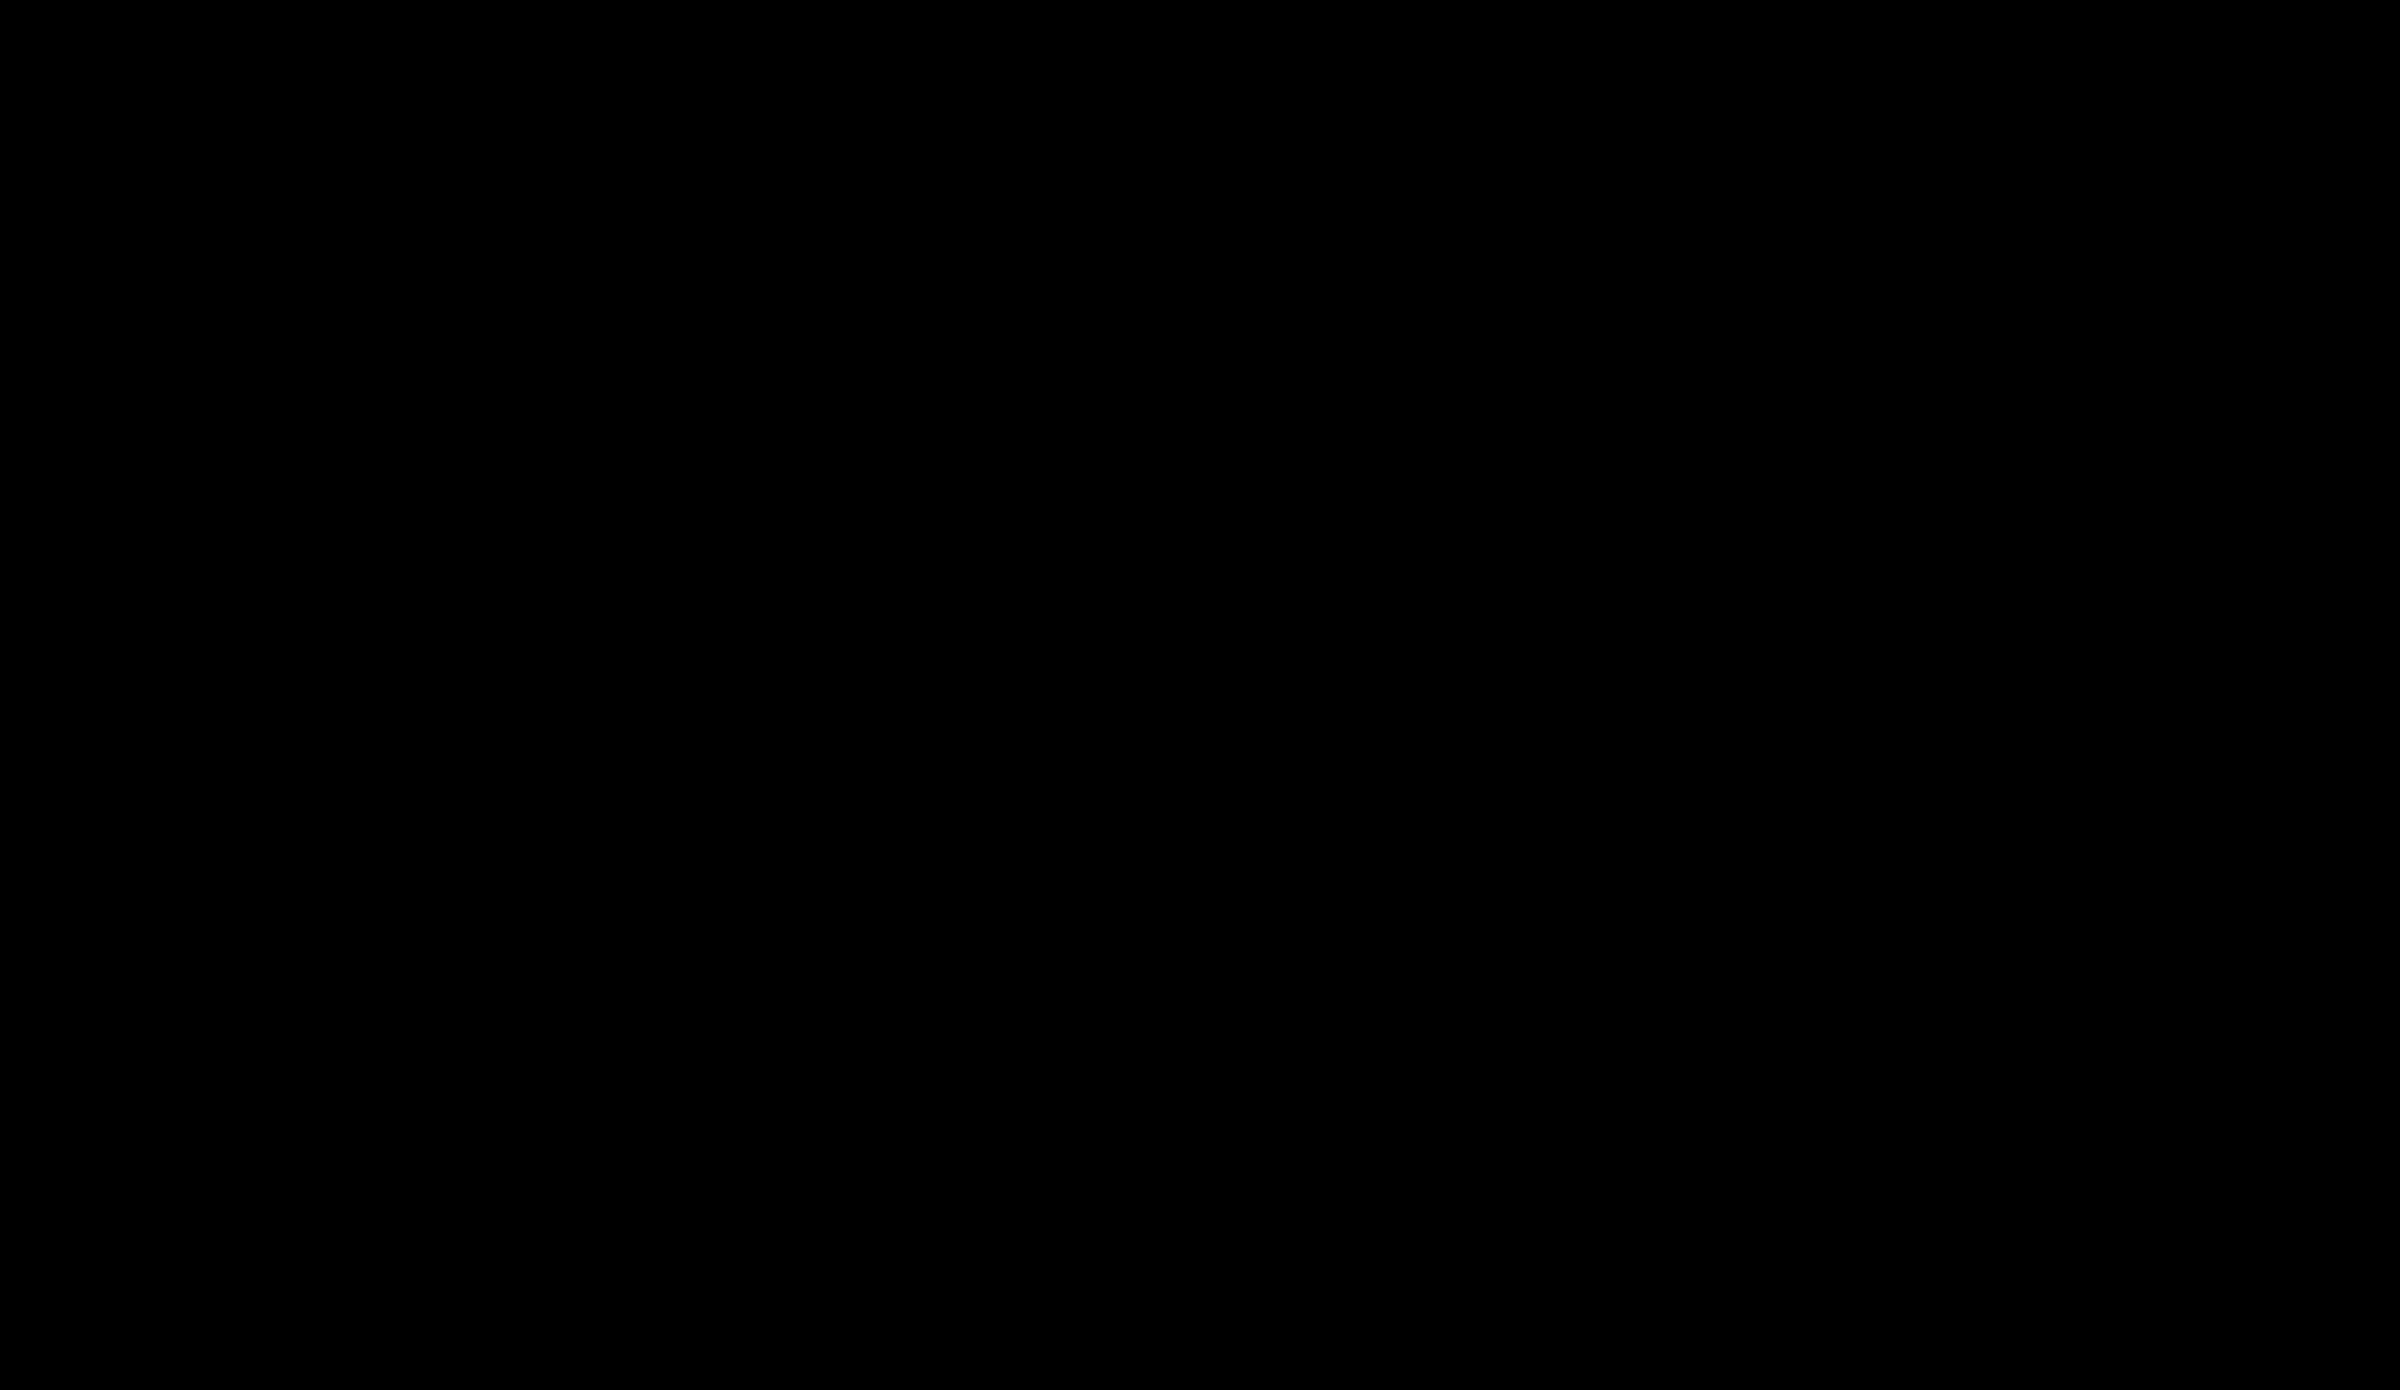 2400x1390 Clipart